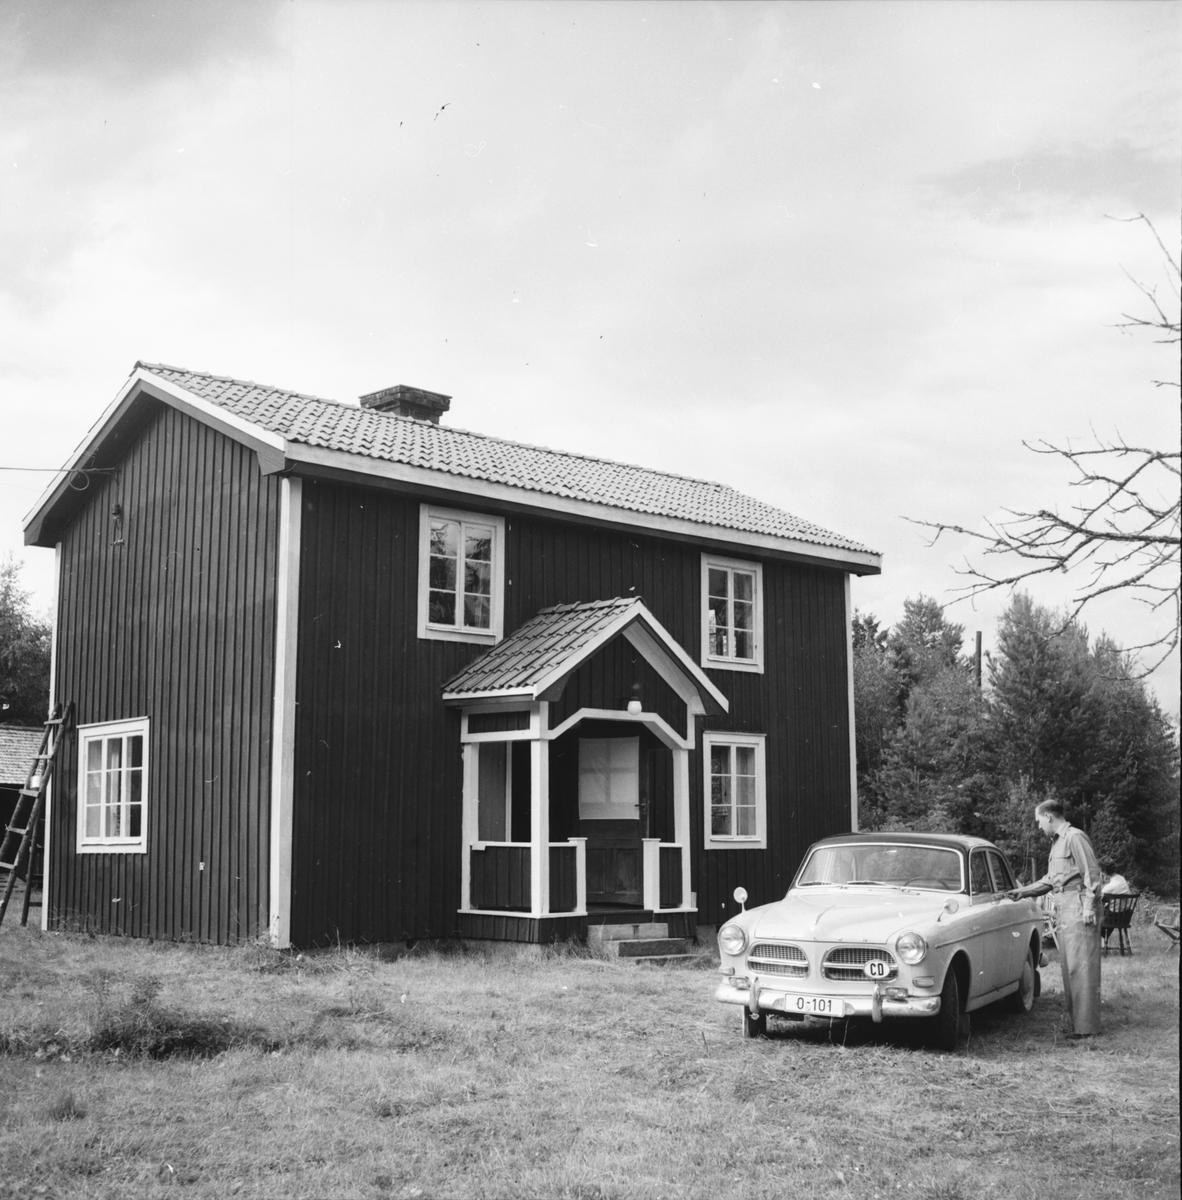 Tödal Ole, Sveriges ambassadör i Bonn är torpägare Mörtsjö, Arbrå kommun Ståtlig bondgård Växbo Bollnäs